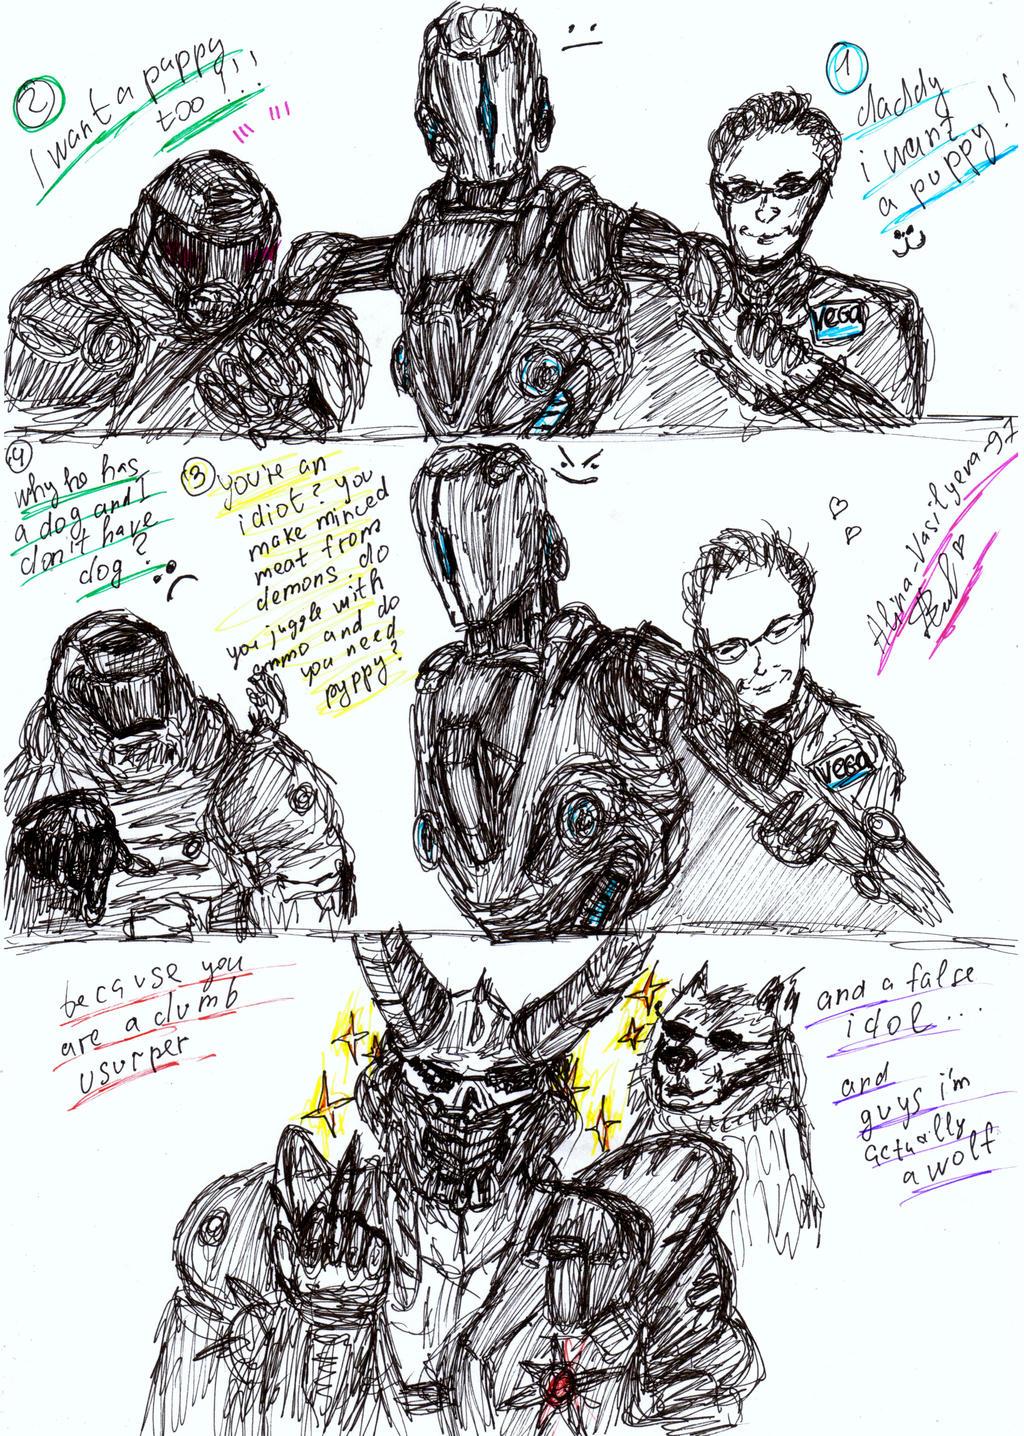 Doom Eternal Meme 2 By Alina Vasilyeva 97 On Deviantart